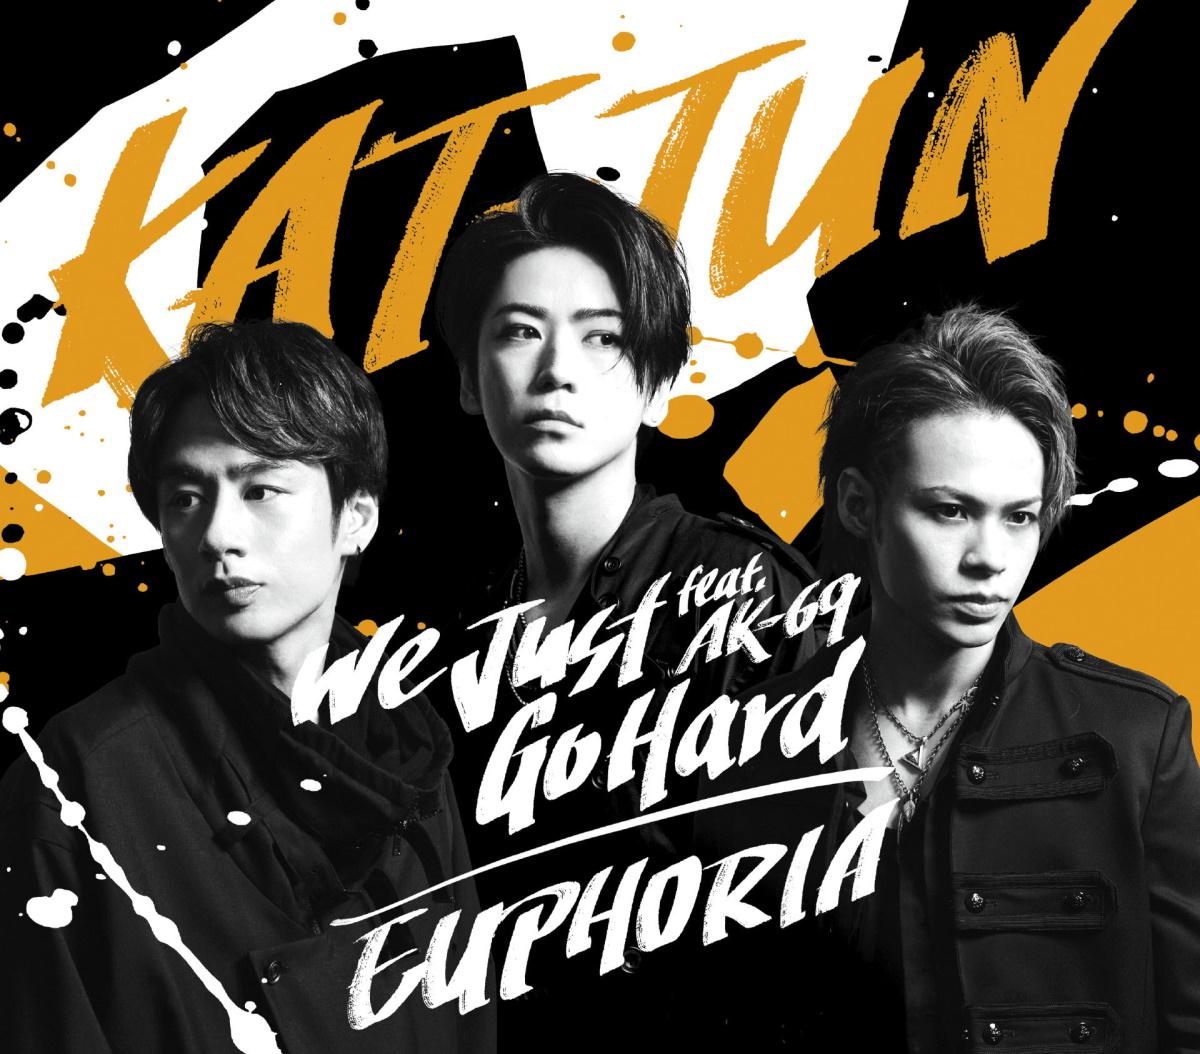 『KAT-TUN - We Just Go Hard feat.AK-69』収録の『We Just Go Hard feat. AK-69 / EUPHORIA』ジャケット